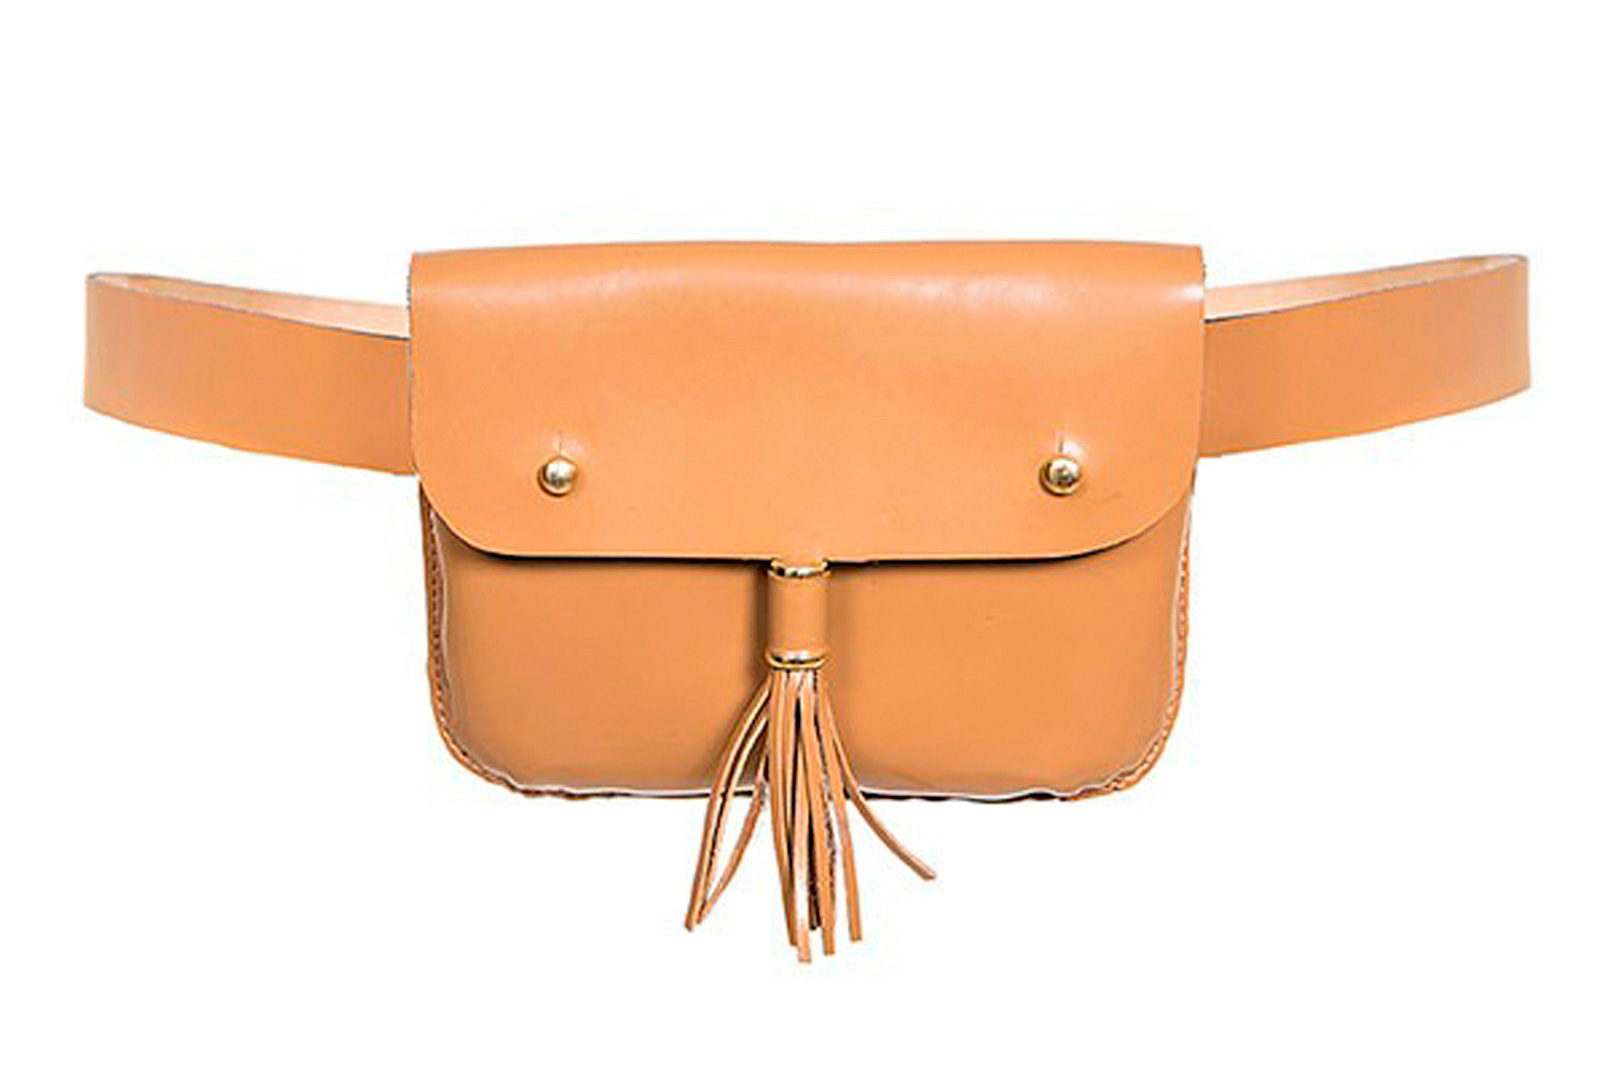 Pochete-fanny-pack-belt-bag-sac-banane-waist-cris-barros